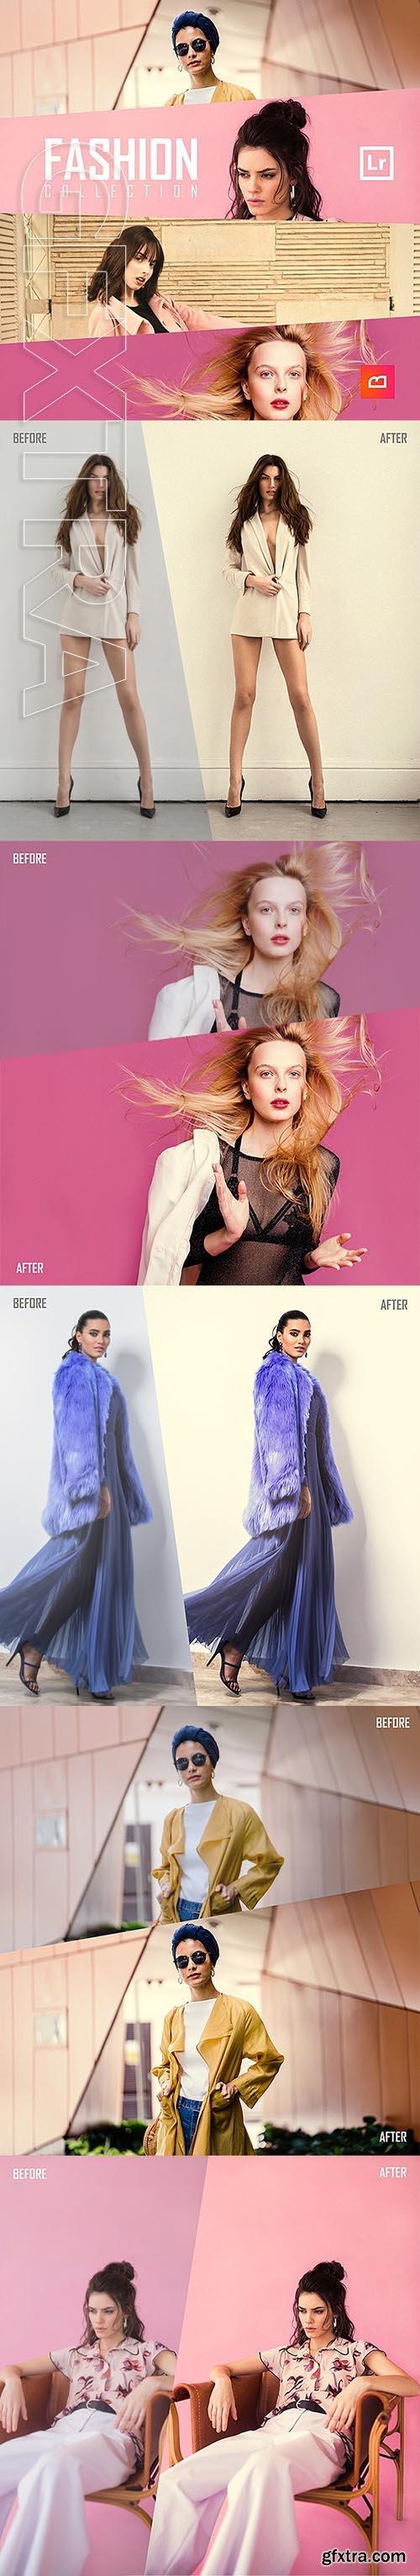 GraphicRiver - Fashion Collection - Golden Lightroom Preset 24348886